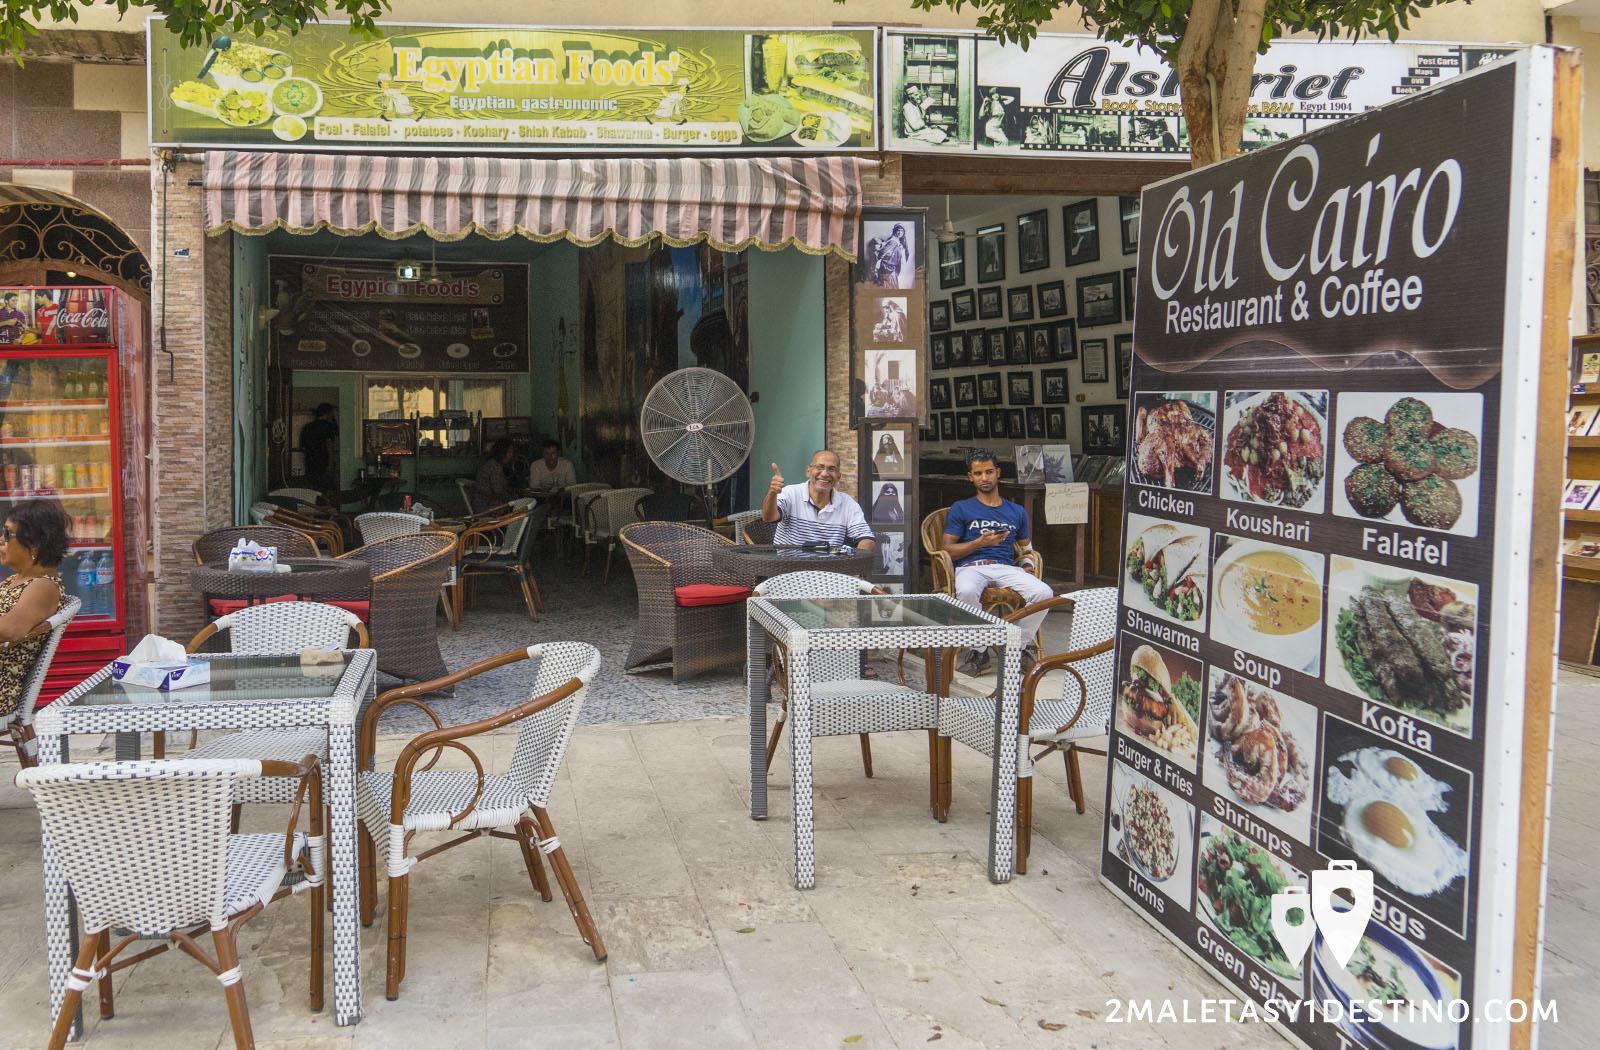 Old Cairo Restaurant & Coffee barrio copto